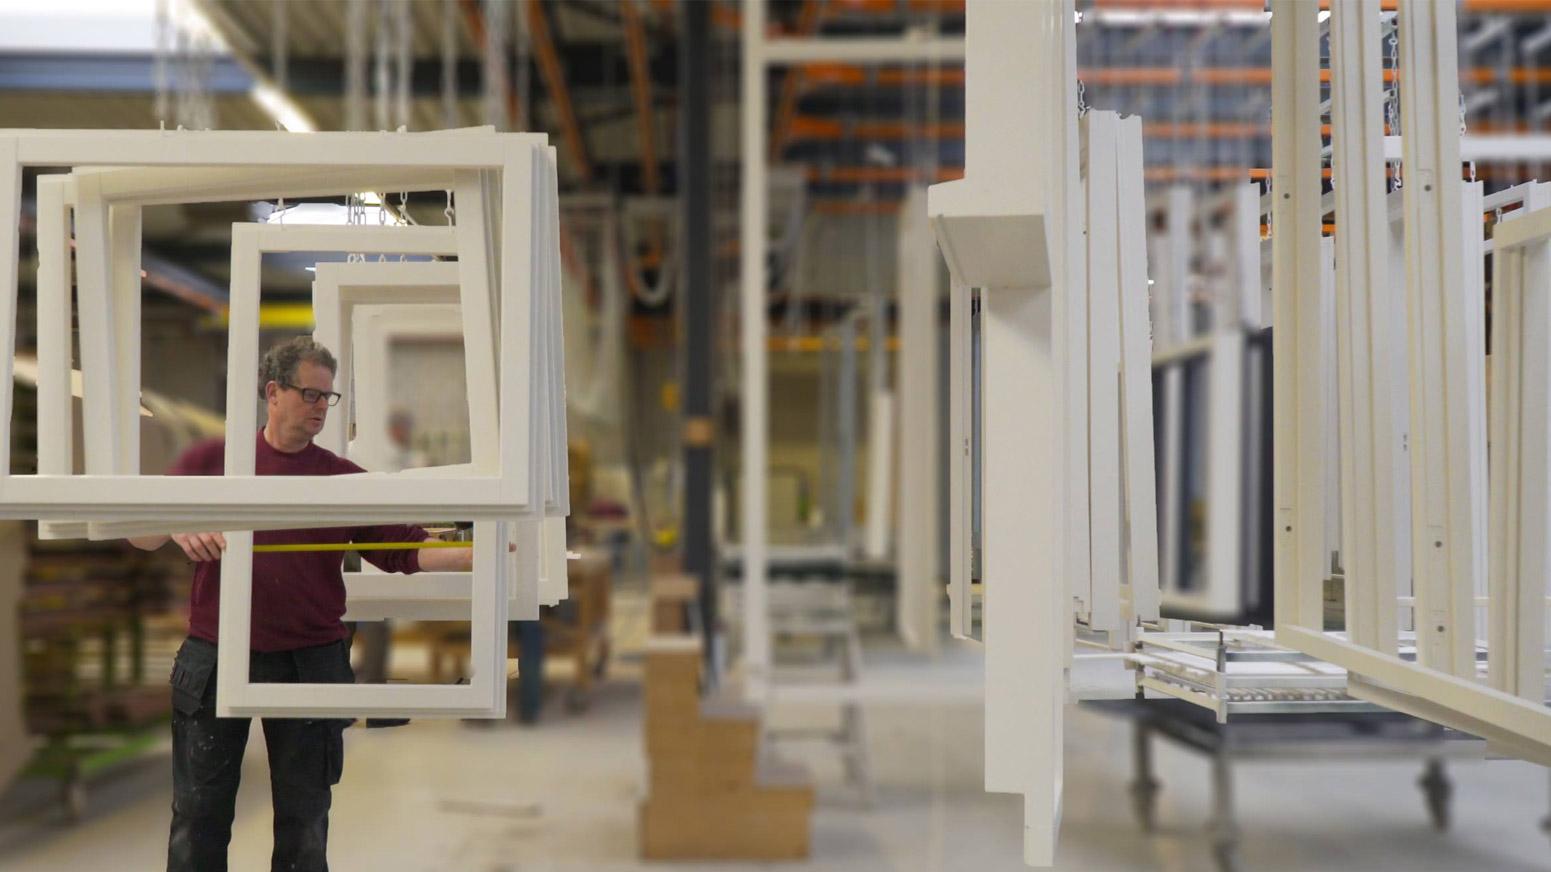 Werkplaats Timmerfabriek Schouten B.V. Zwaagdijk